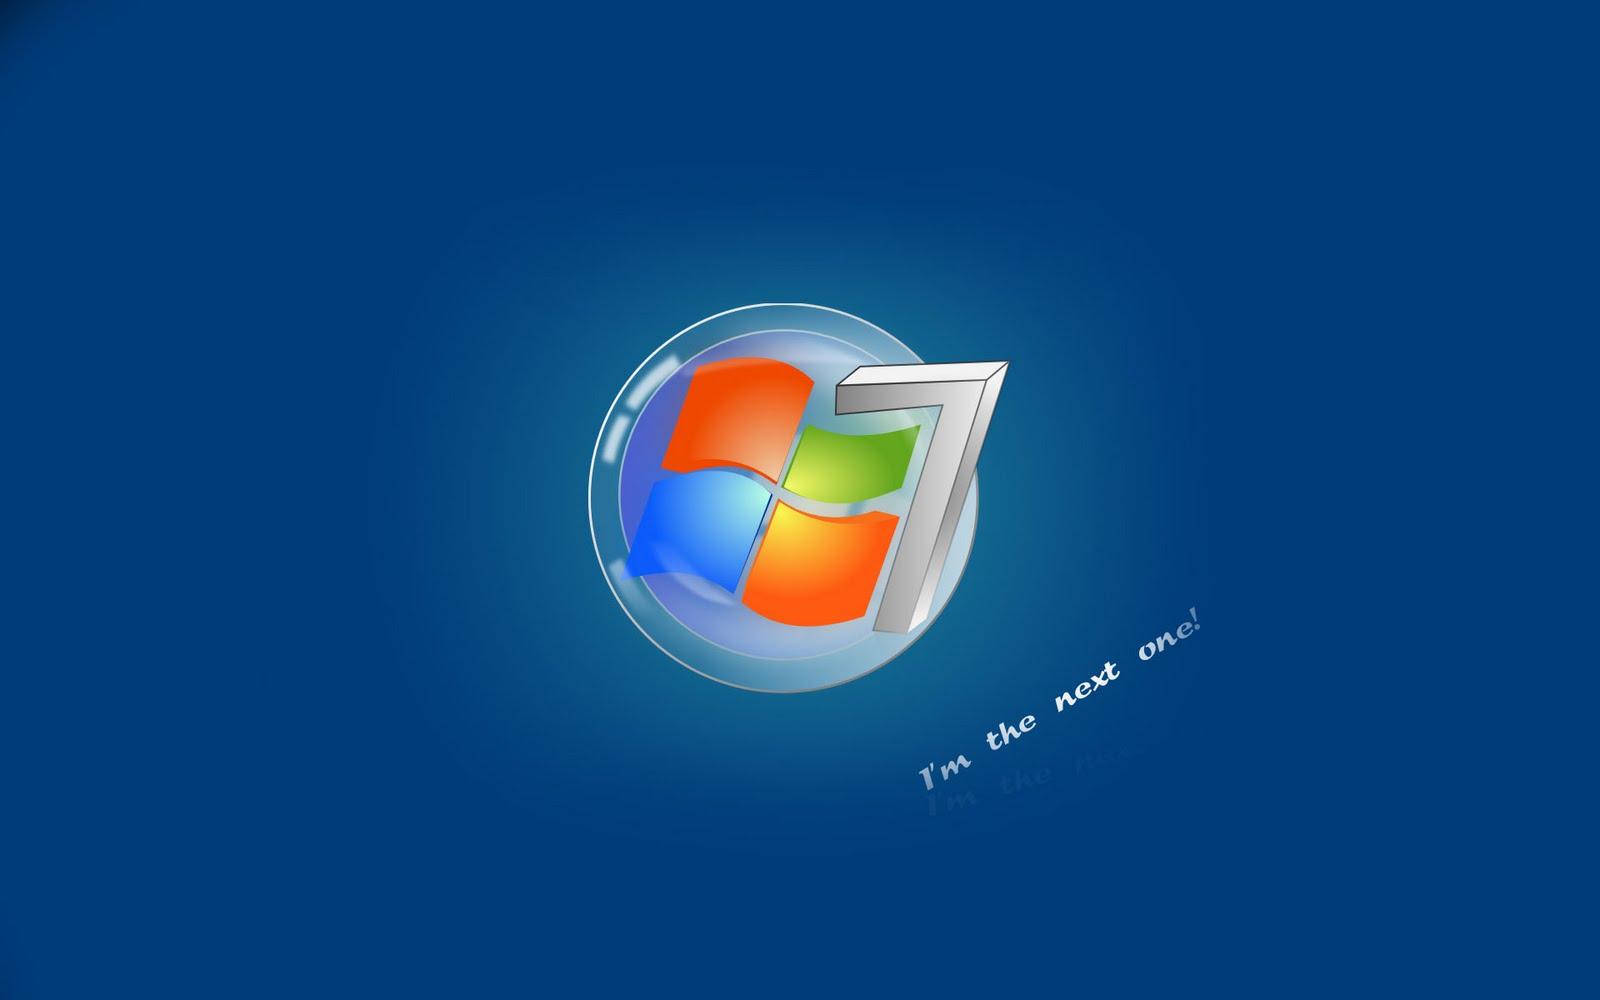 http://1.bp.blogspot.com/_6uA6OFi0qwo/TNCxY3Rv53I/AAAAAAAABTc/KW8q-BK6NUc/s1600/Windows%2B7%2Bultimate%2Bcollection%2Bof%2Bwallpapers.5.jpg